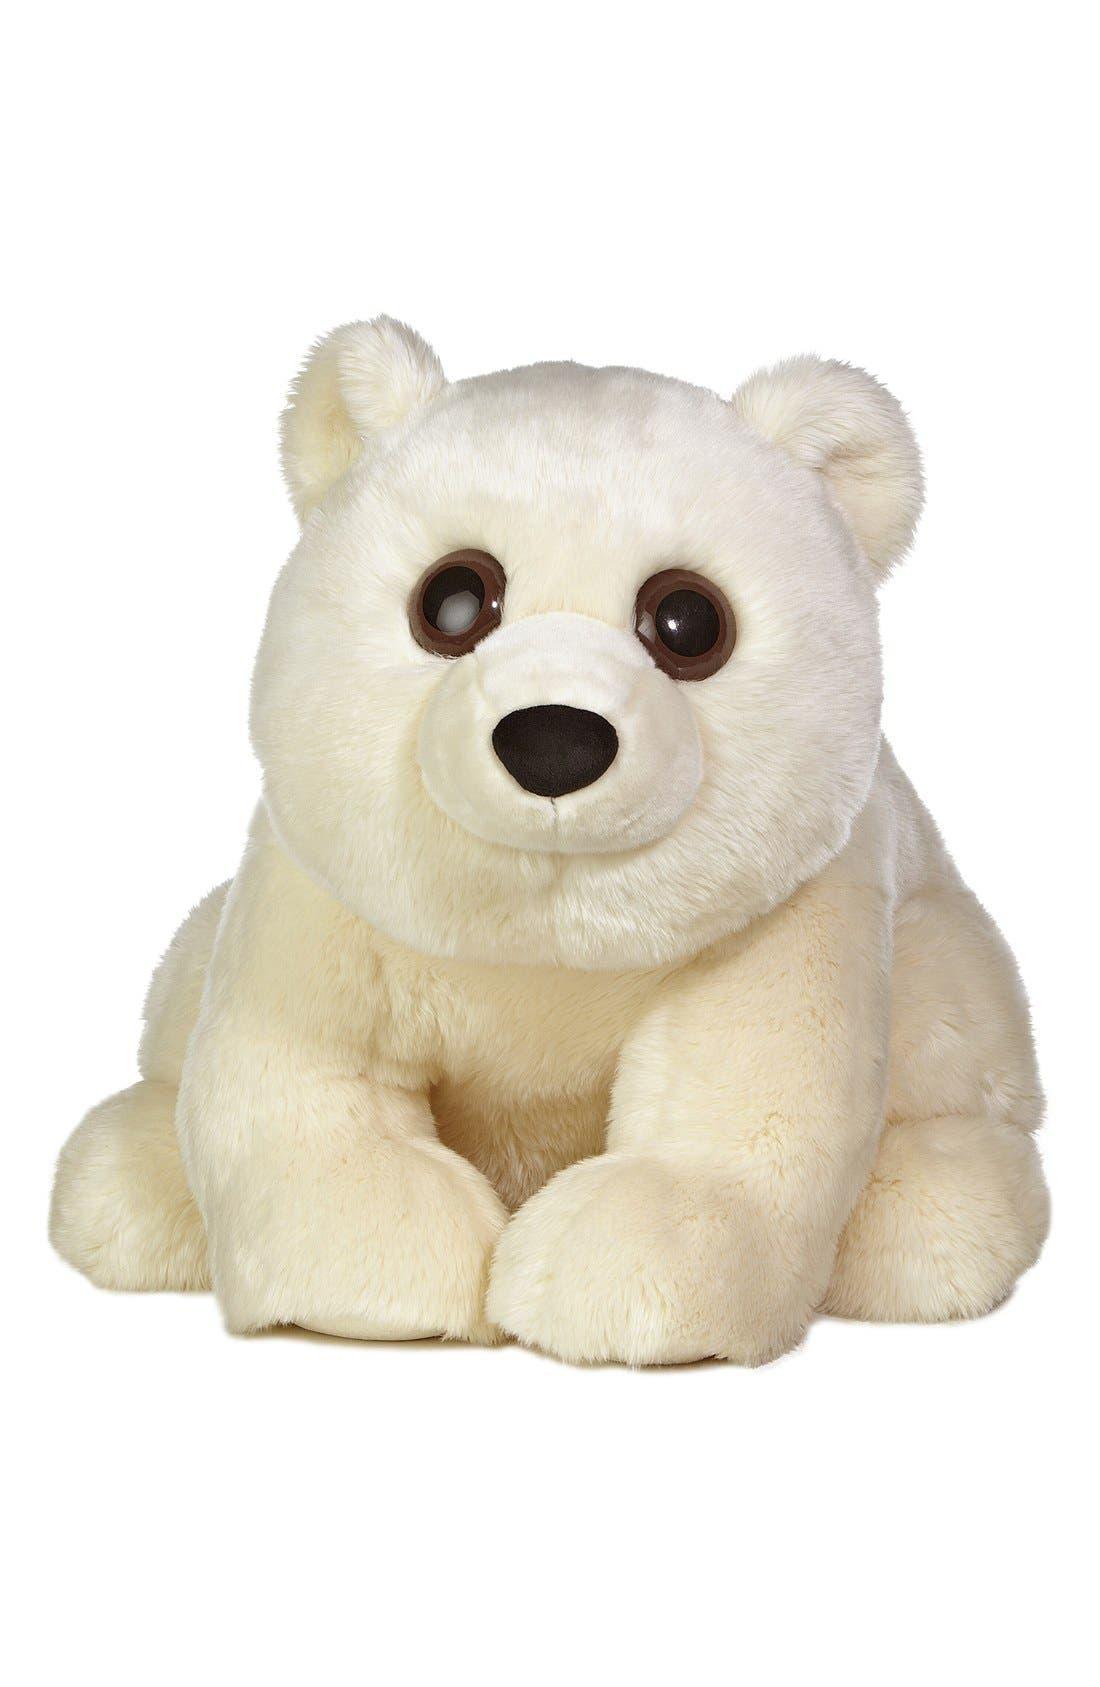 'Americana Bears - Arctic Polar Bear' Stuffed Animal,                             Main thumbnail 1, color,                             WHITE